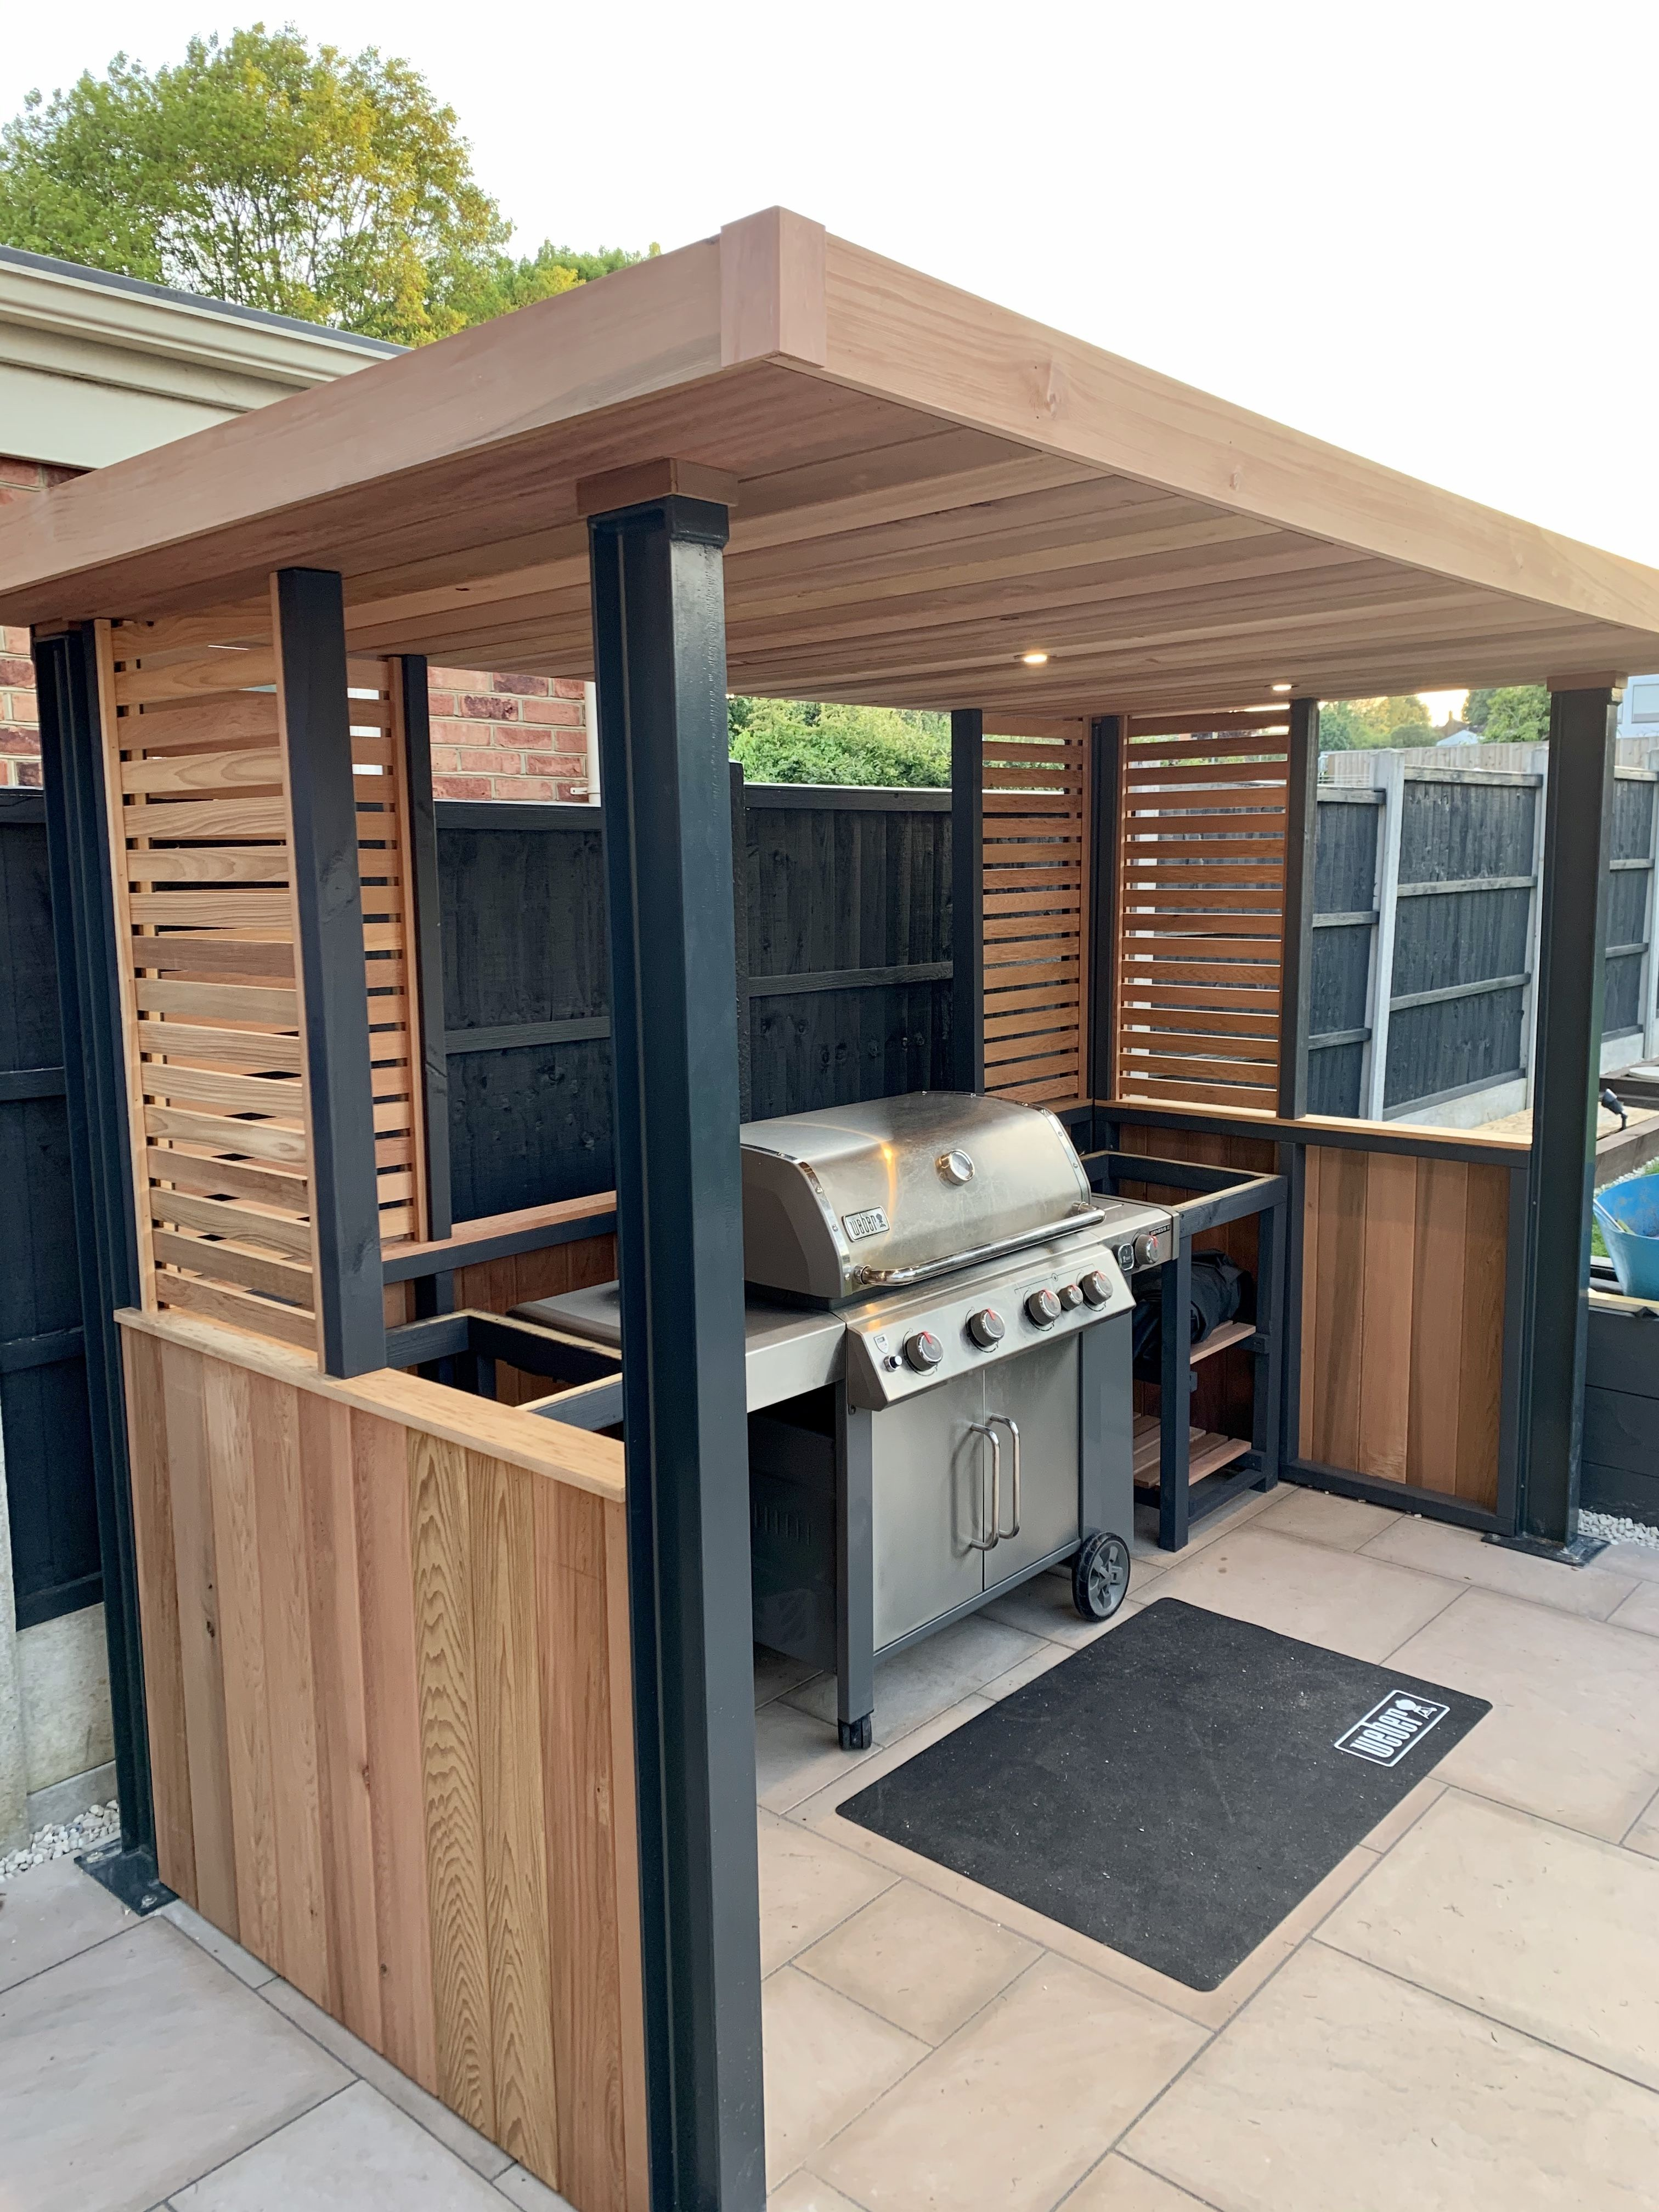 Tuin en terras 3 Sizes 2 x Barbecue BBQ Grill Cedar Wood